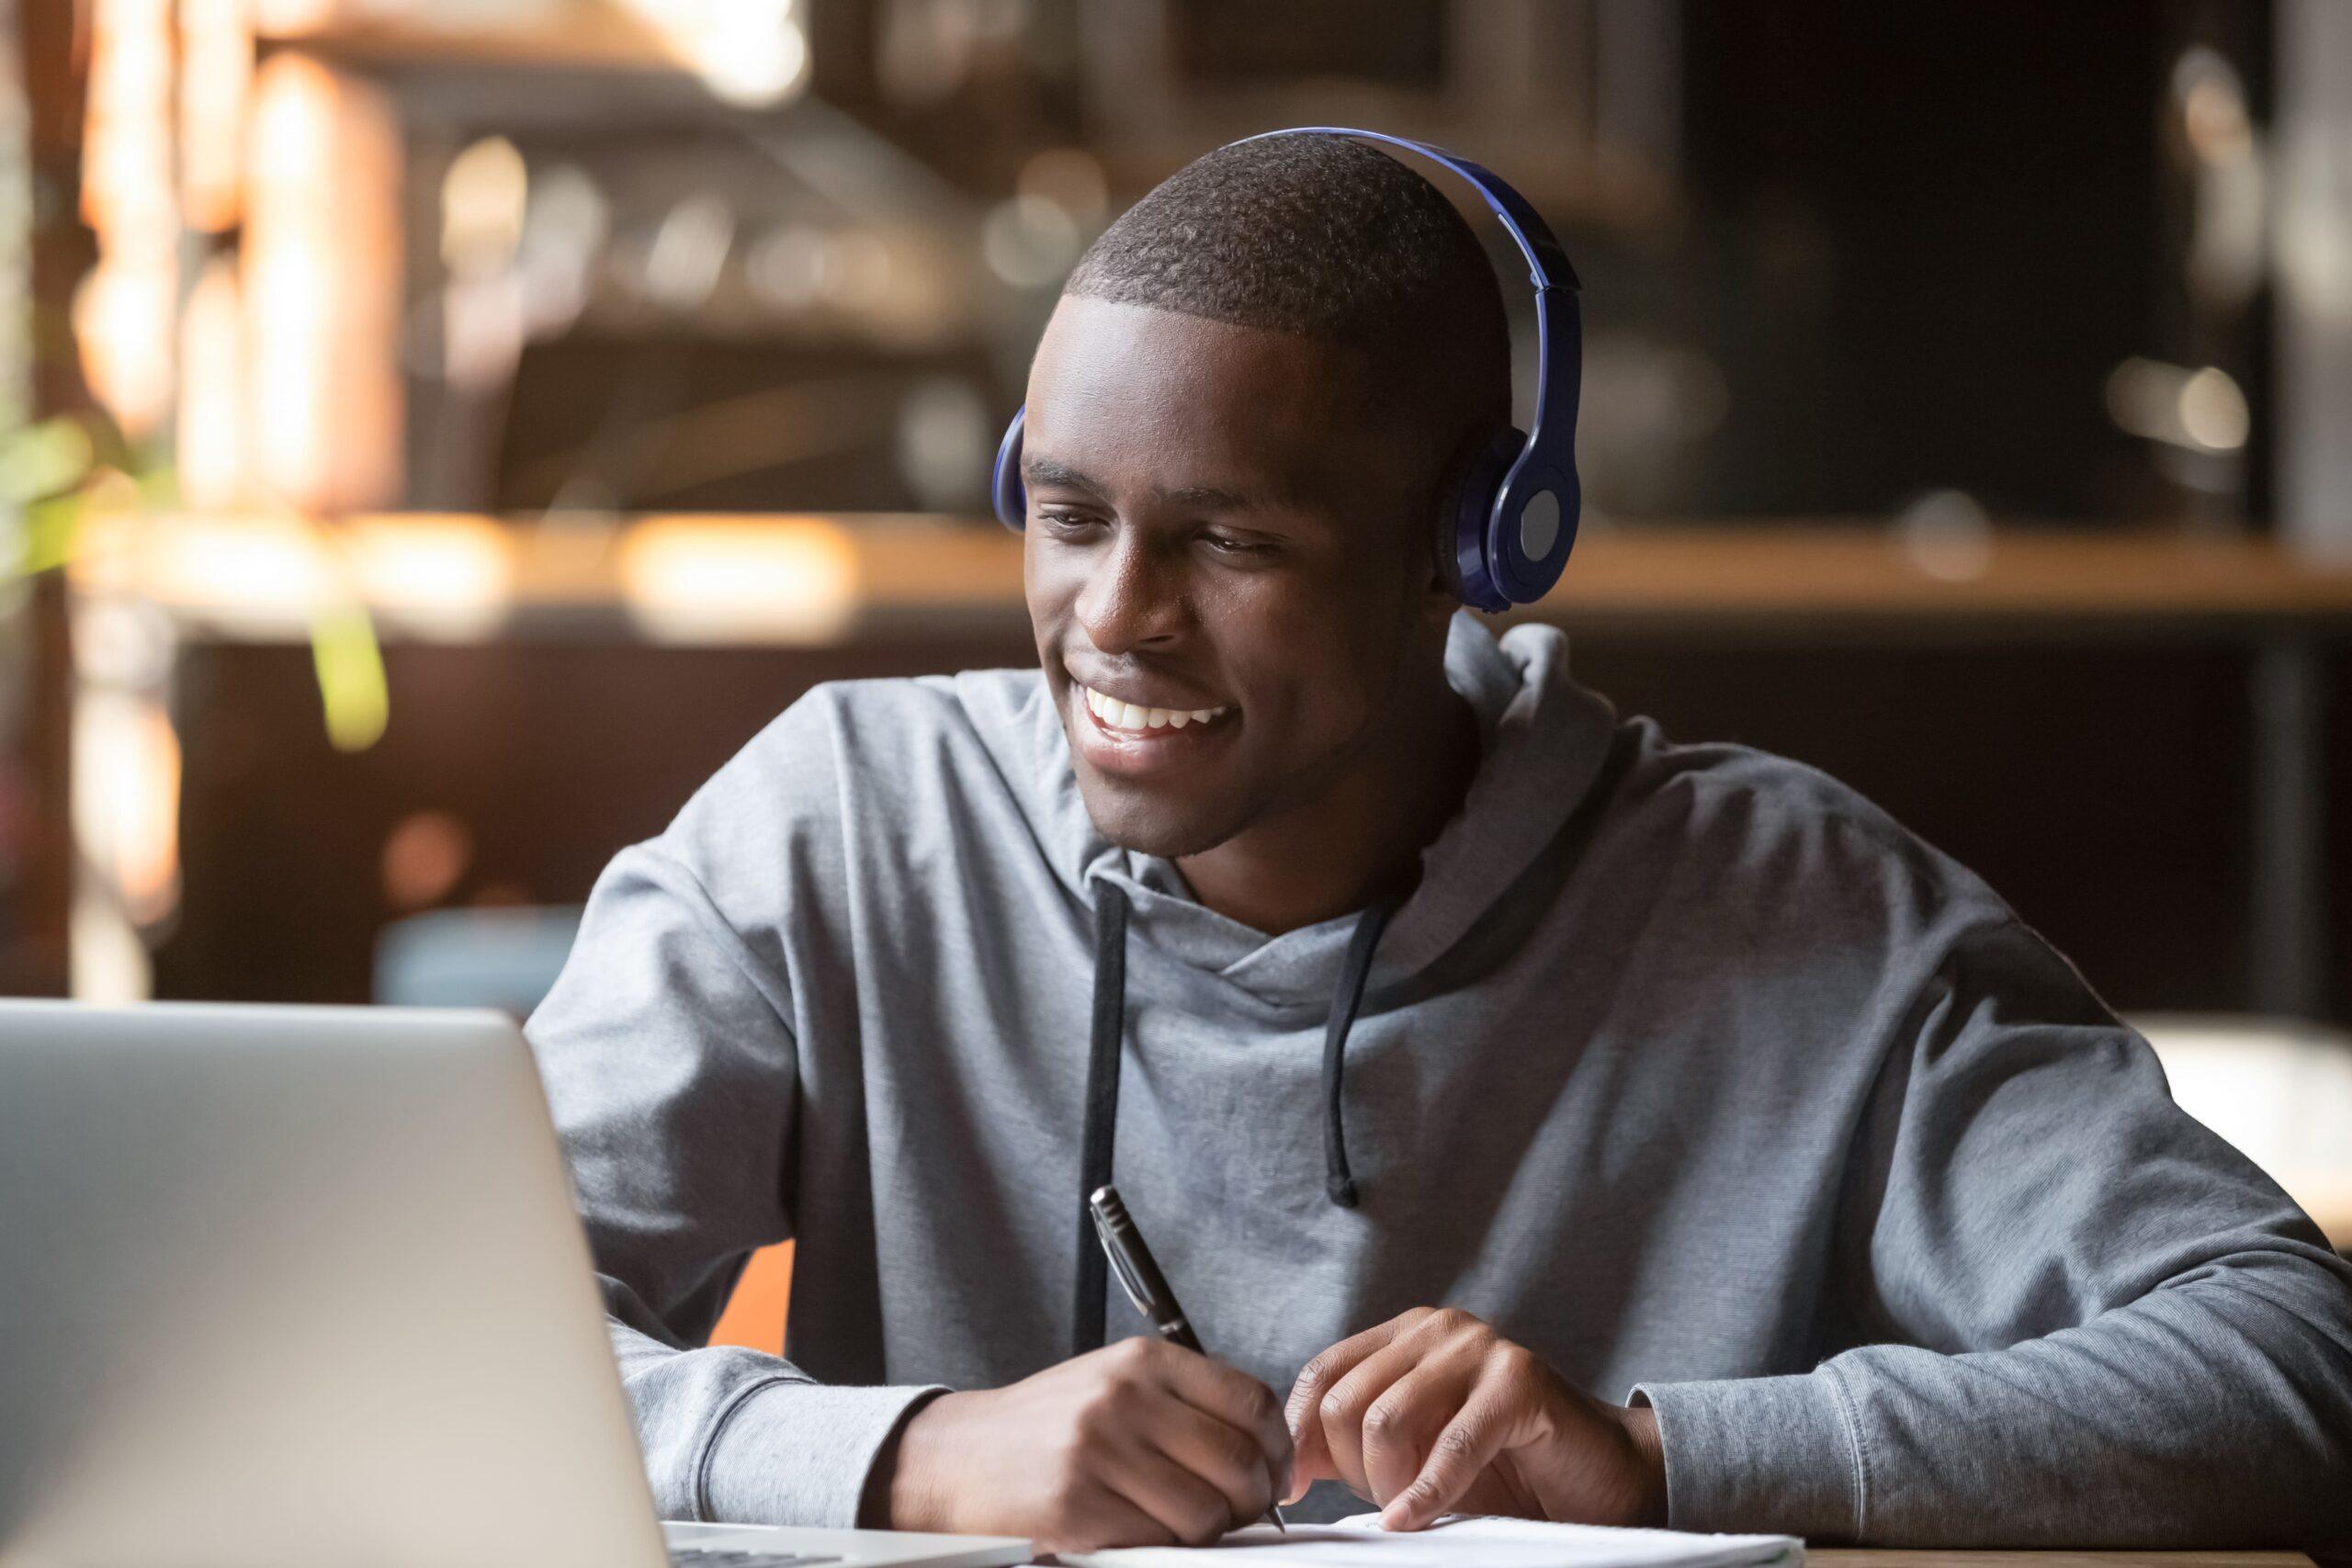 Man Learning Online